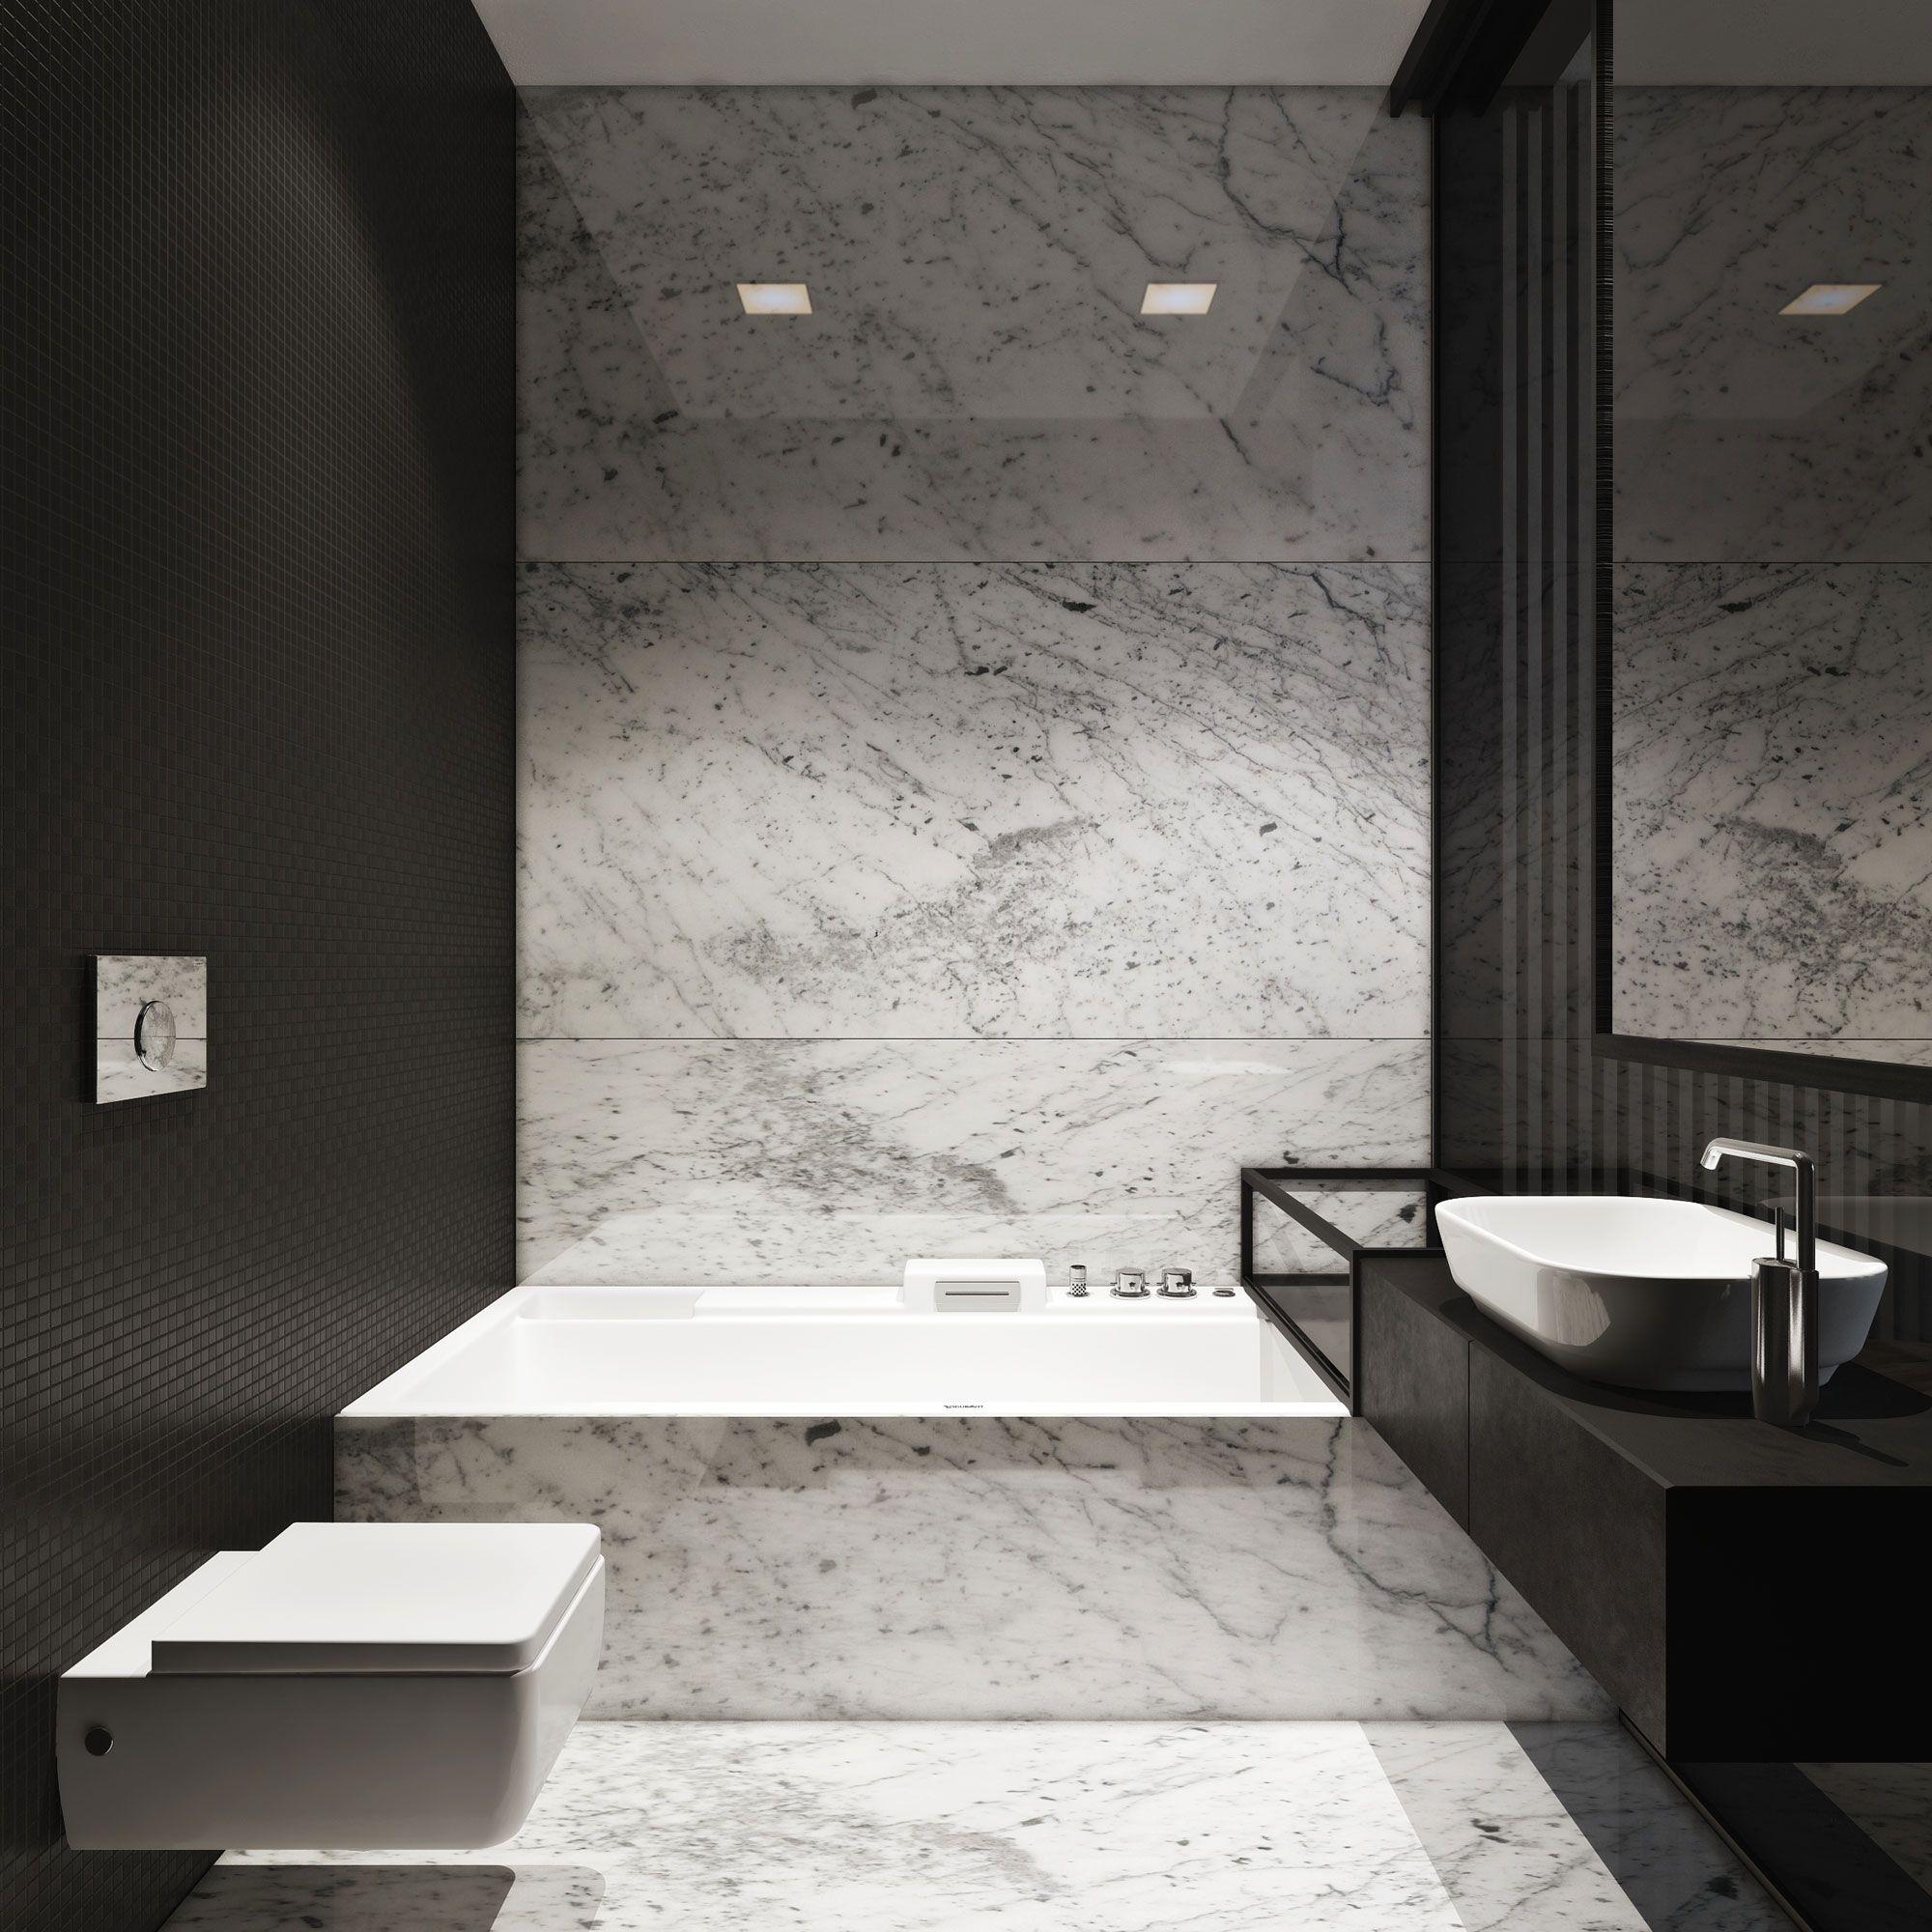 townhouse by igor sirotov architect 25 kitchen bath spa pinterest b der badezimmer. Black Bedroom Furniture Sets. Home Design Ideas